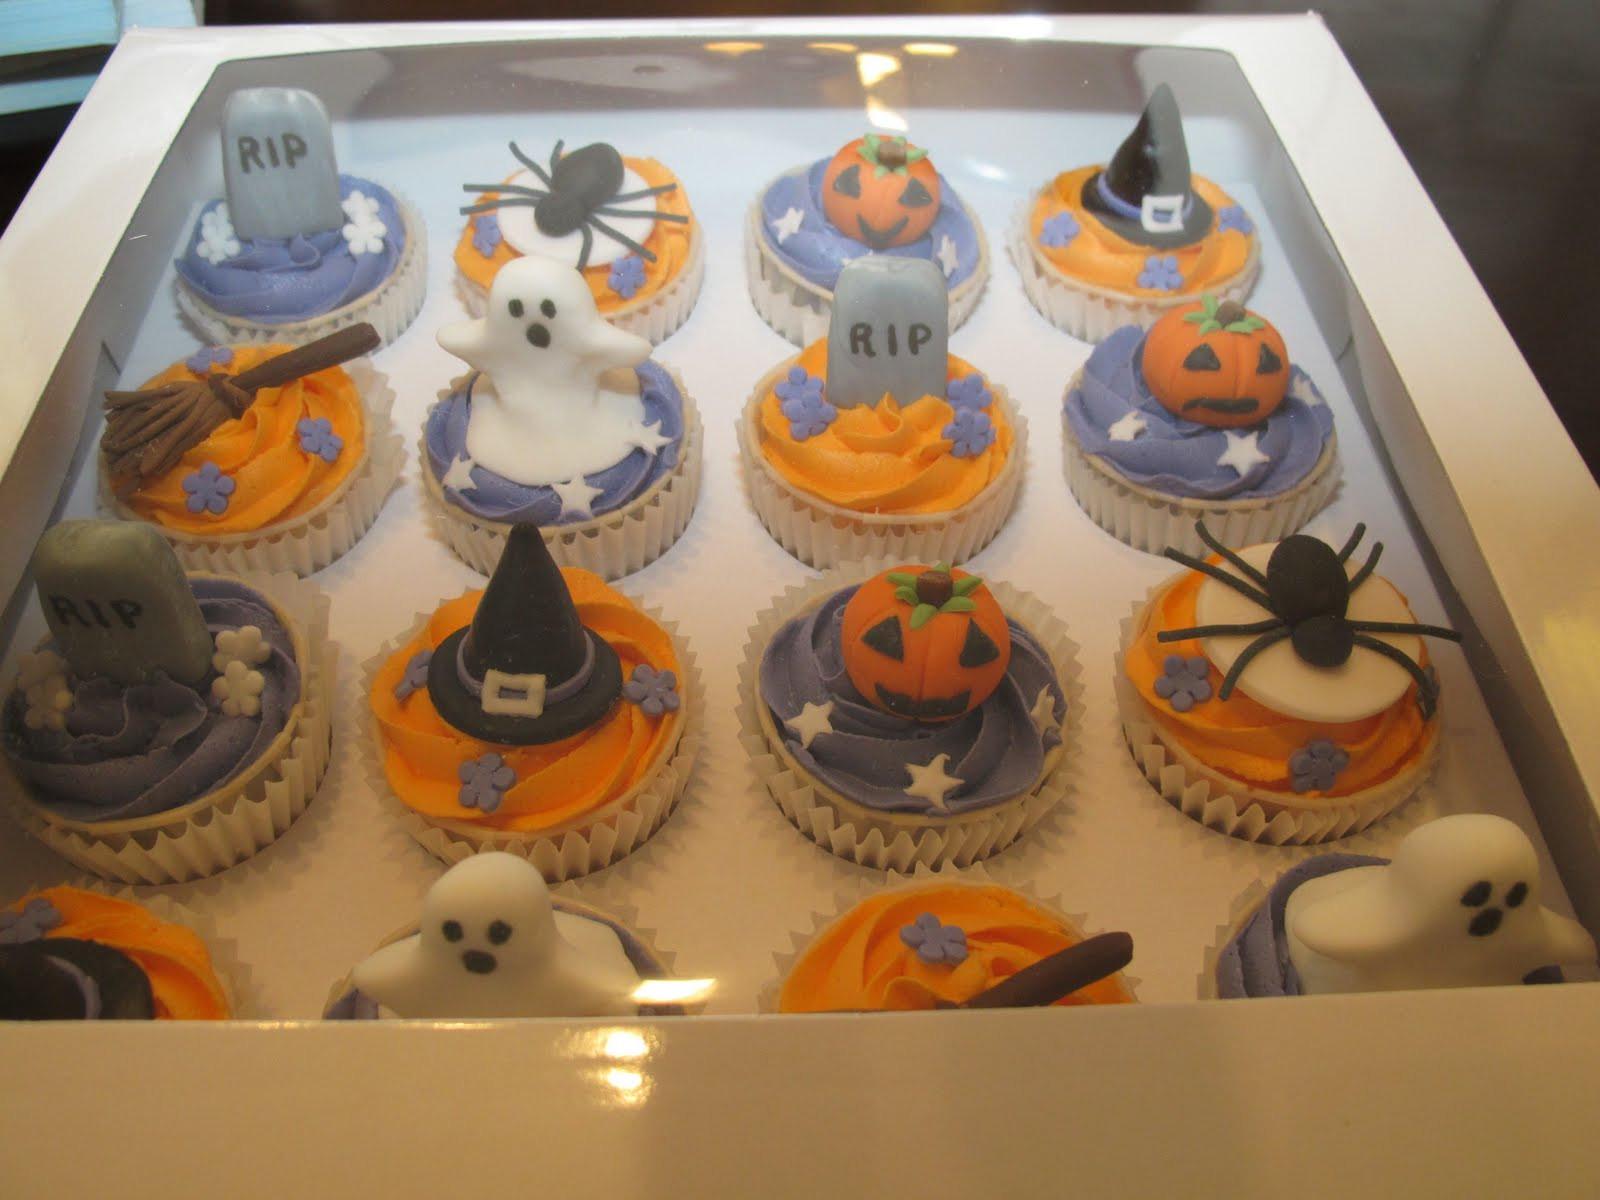 Halloween Cupcake Cakes  Pink Oven Cakes and Cookies Halloween cupcake ideas